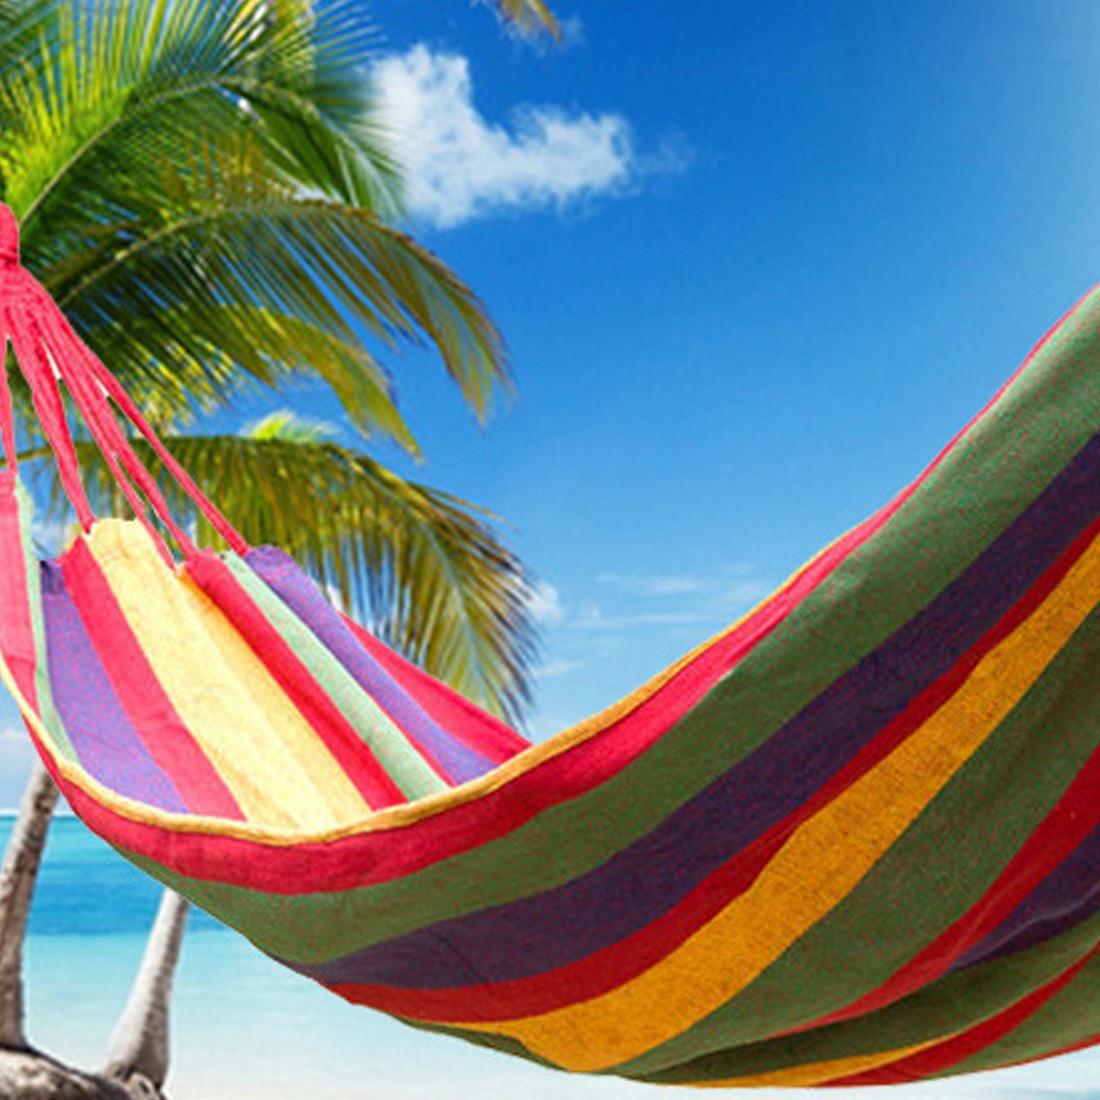 2018 NEW 1 Set Portable 150 kg Load-bearing Outdoor Garden Hamac Hang Bed Travel Camping Swing Survival Outdoor Sleeping